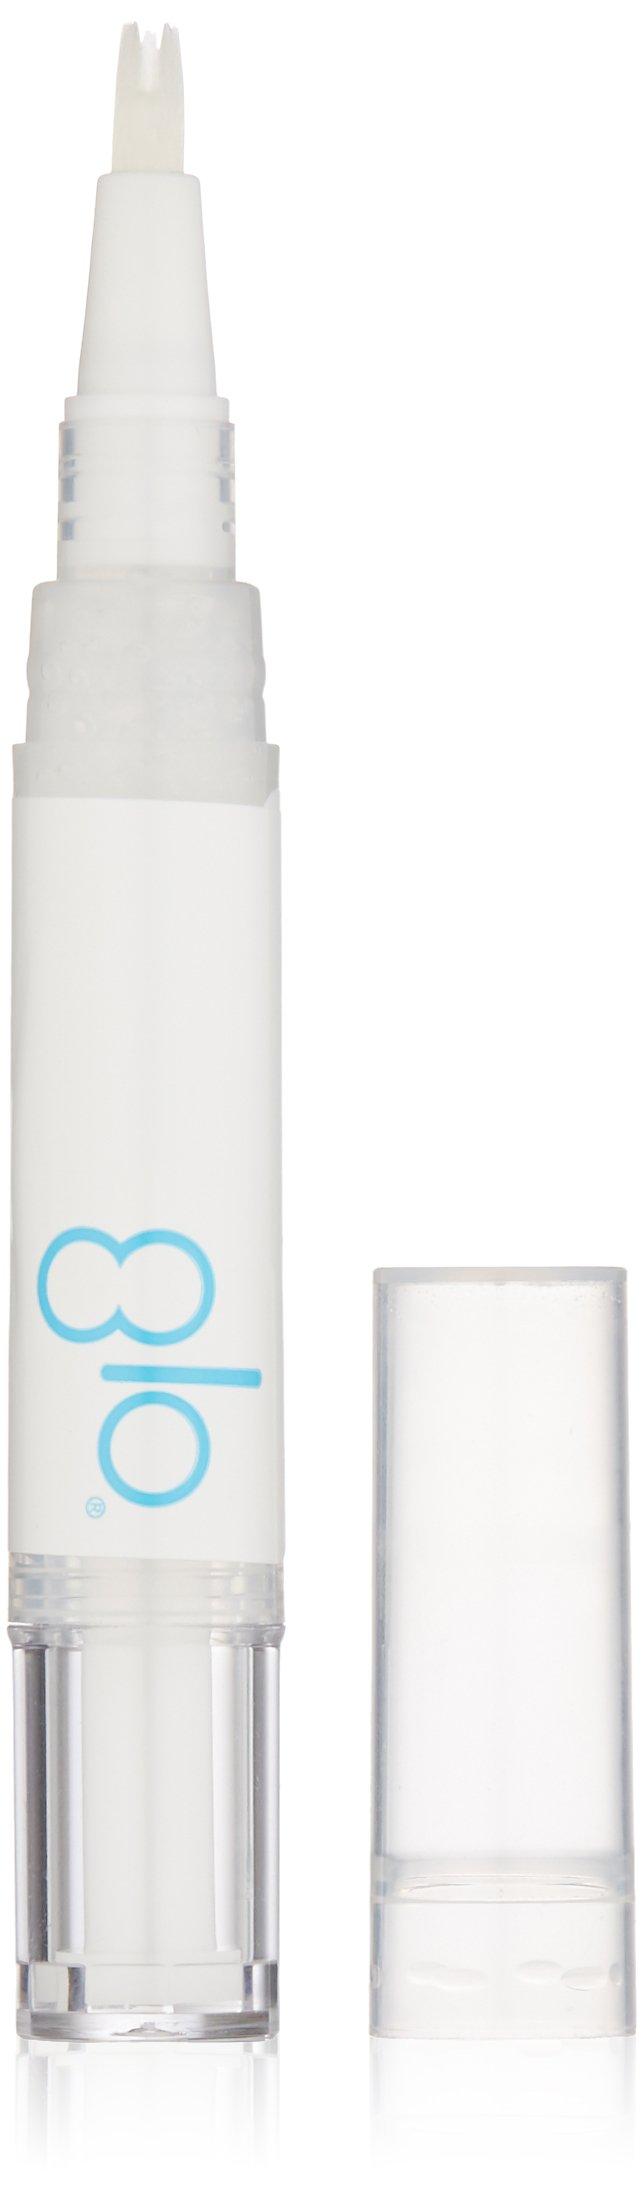 GLO Science Everyday Teeth Whitening Maintenance Pen